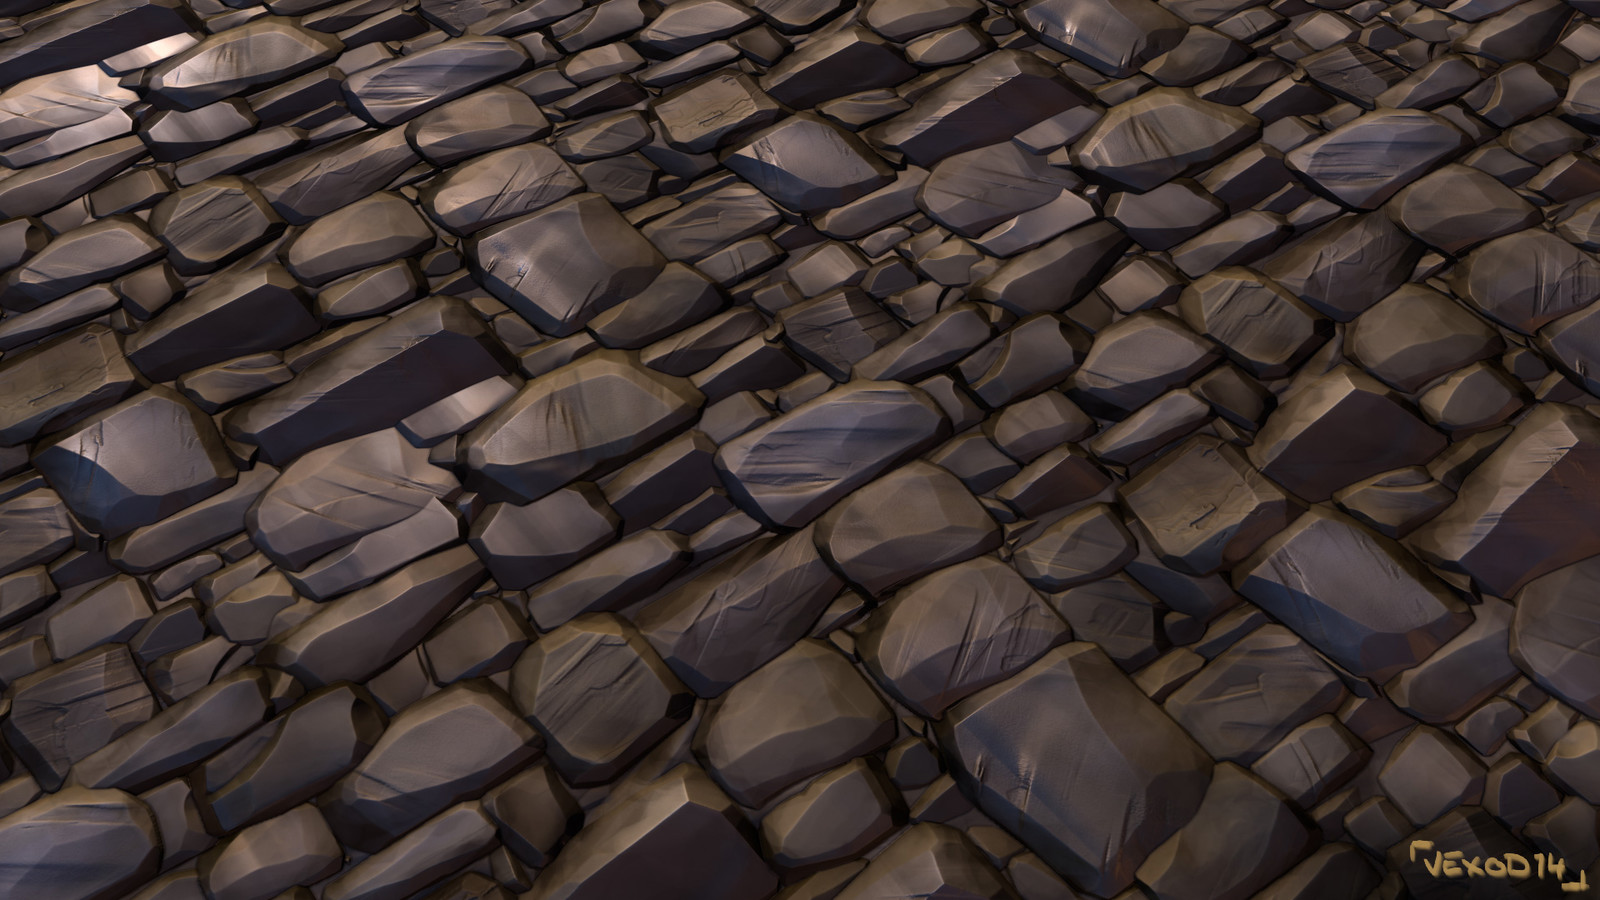 Tileable texture of bricks wall